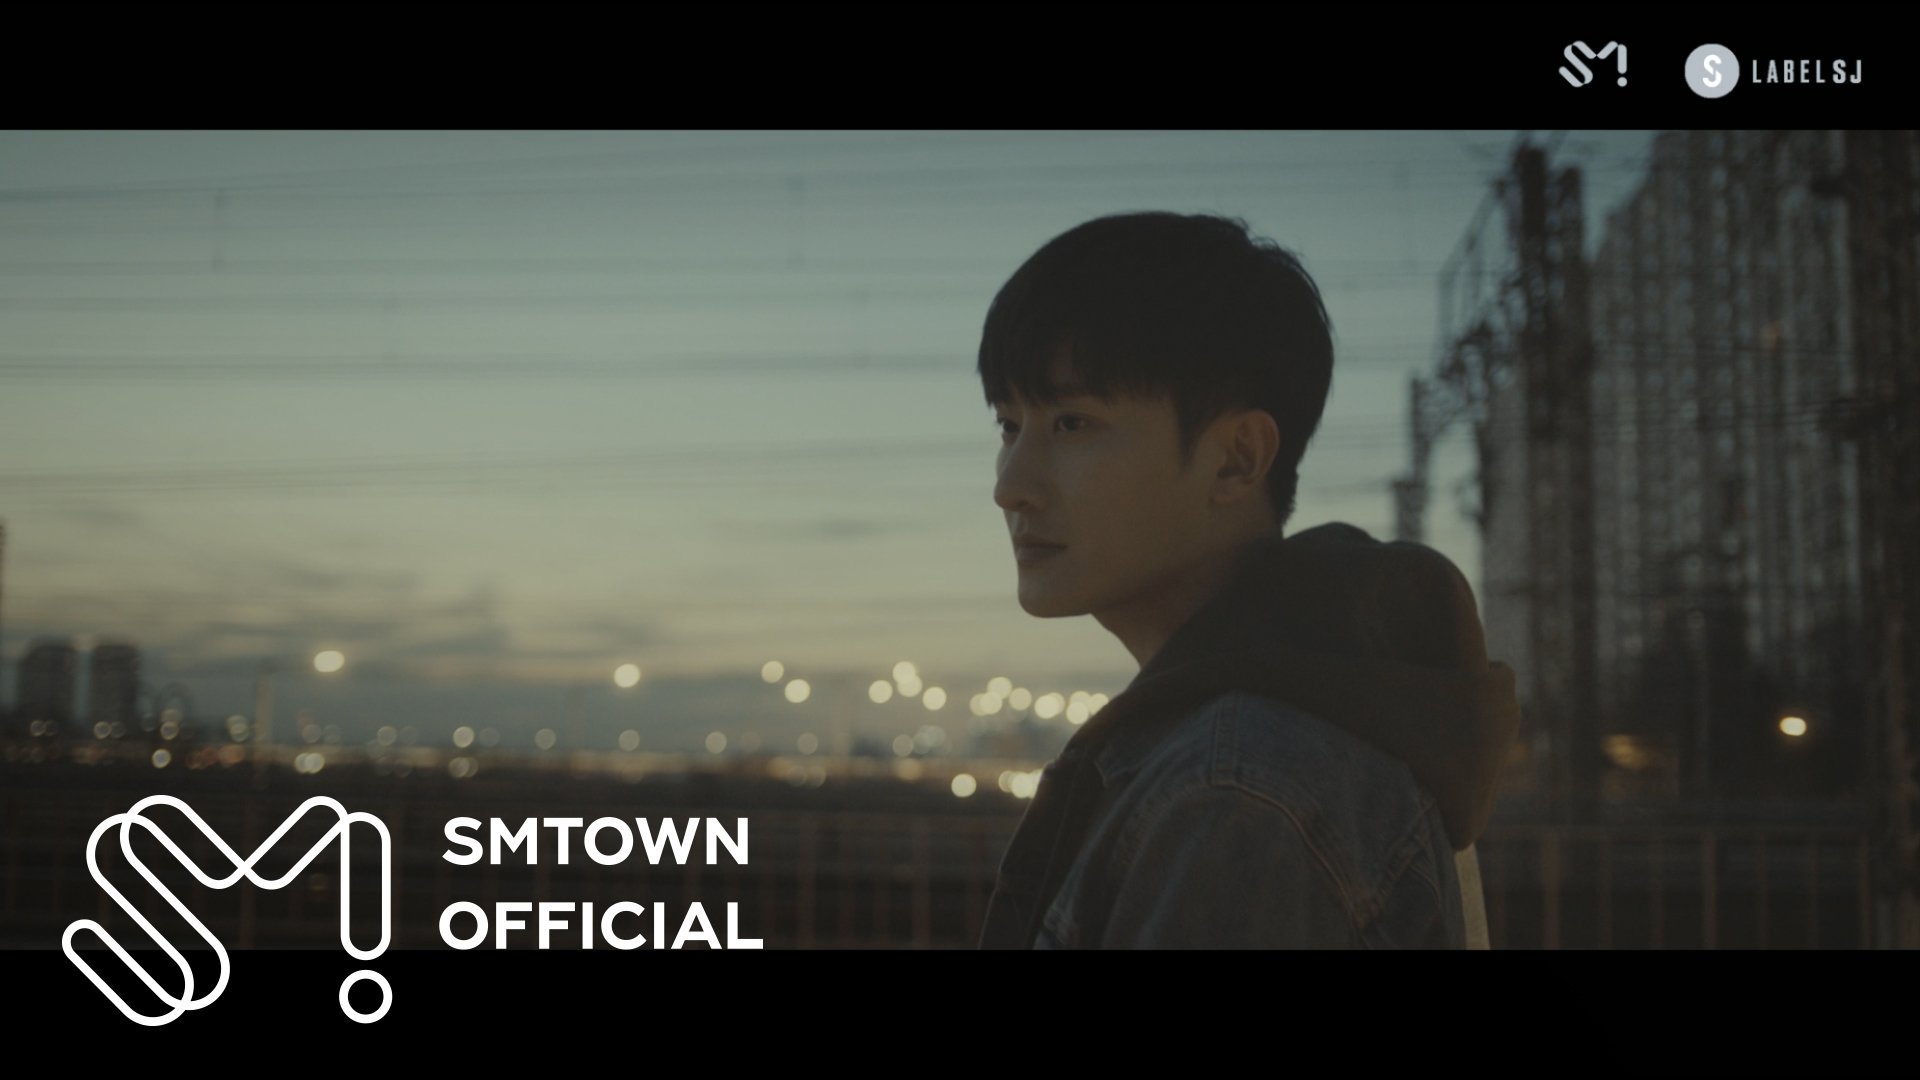 ZHOUMI 조미 '我不管 (I don't care)' MV Teaser  #ZHOUMI #我不管 #IDontCare https://t.co/vfLz6U0c7N